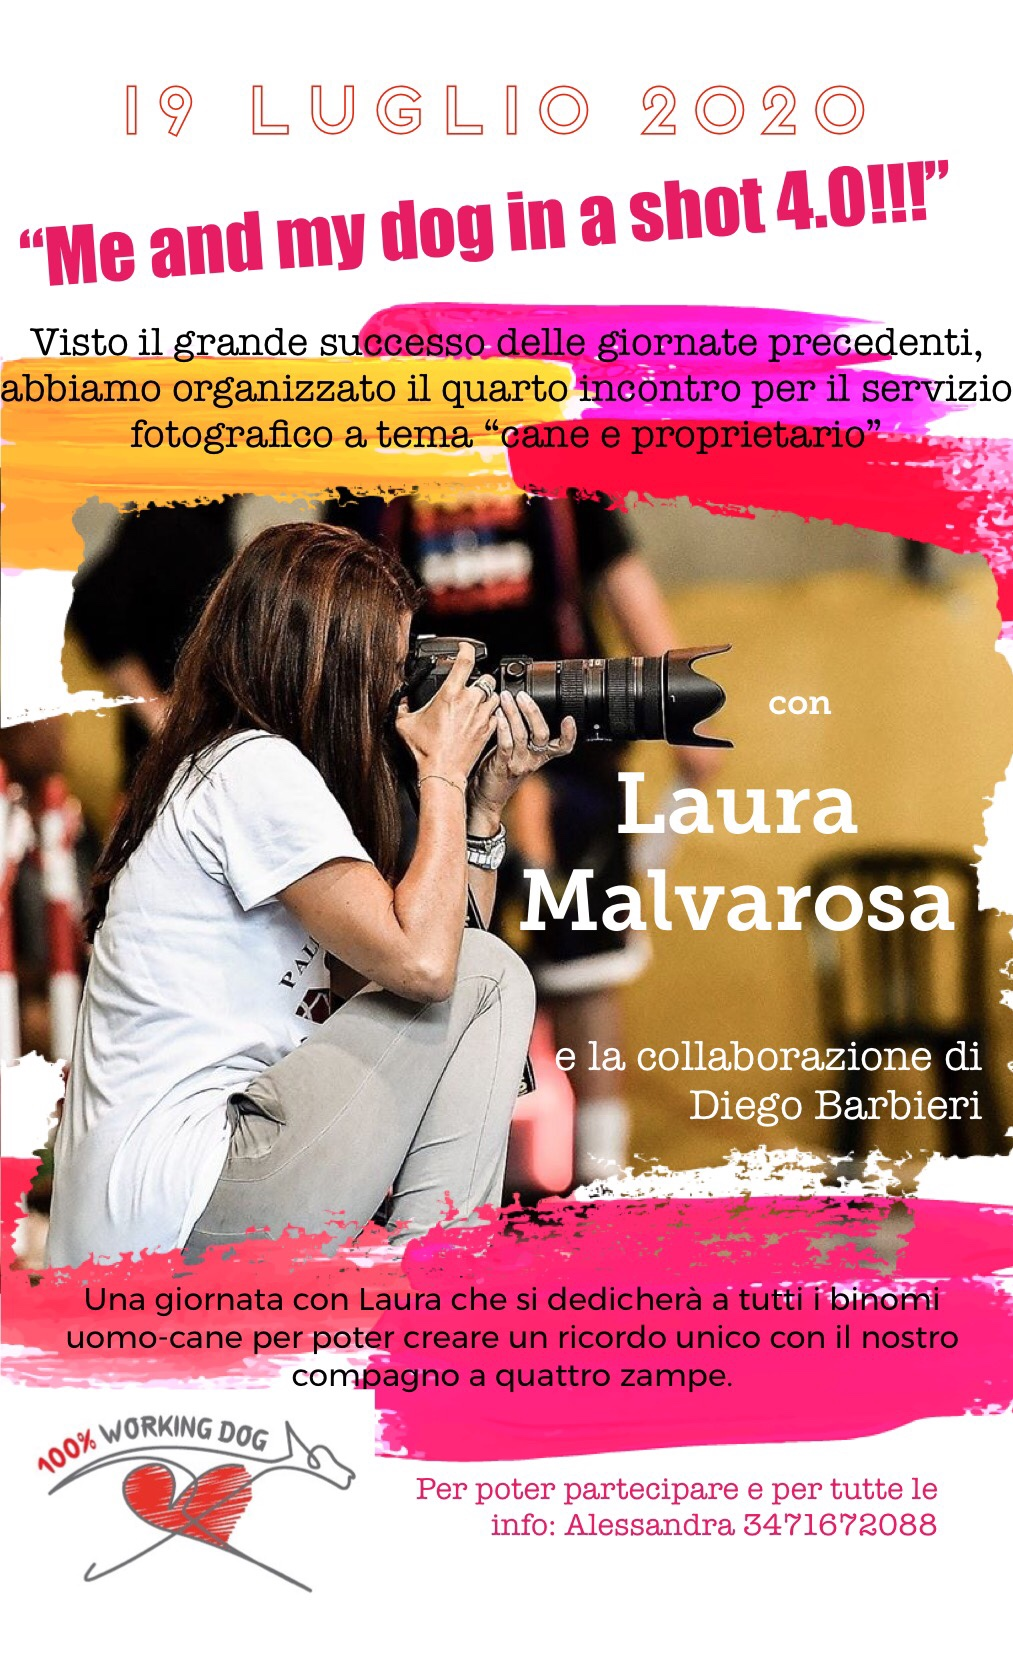 4^ evento fotografico con Laura Malvarosa